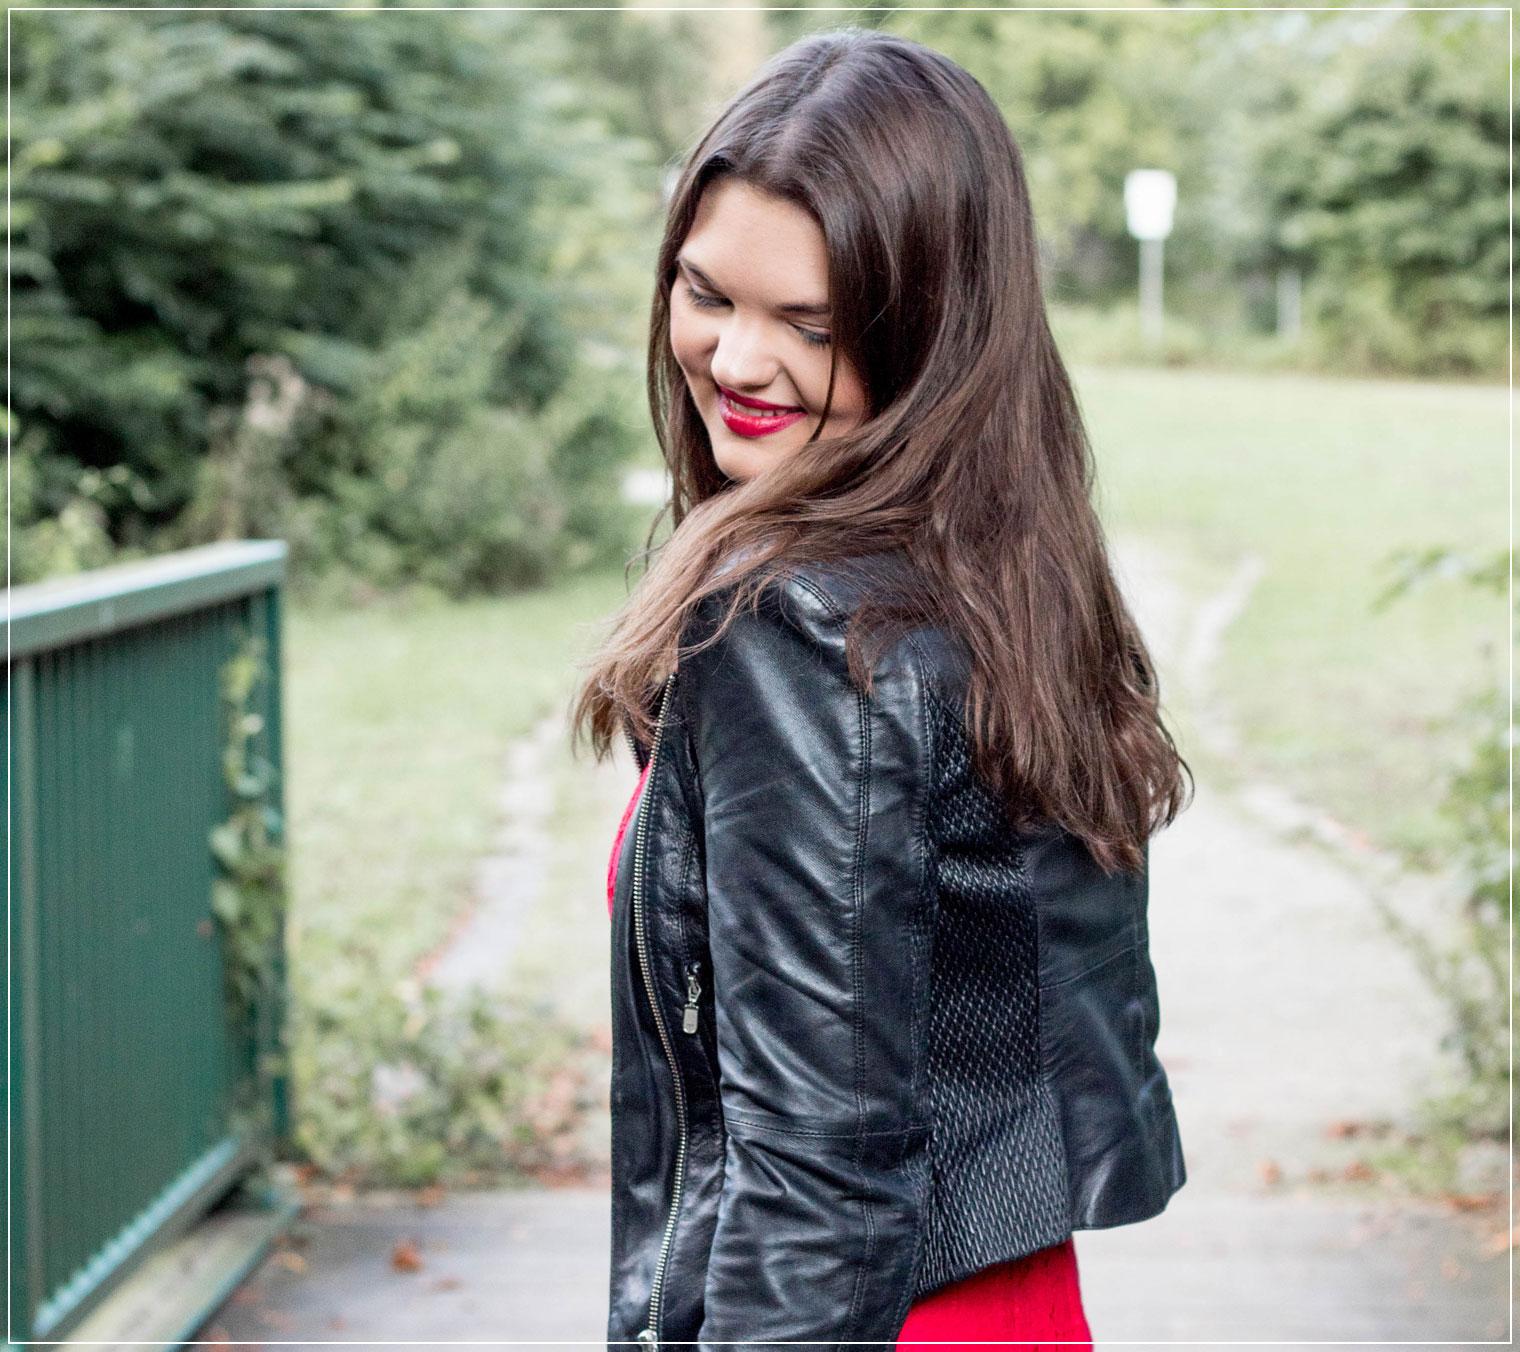 Studiumsende, Studium, Studentenleben, Student, Studentproblems, Lifestyleblog, Ruhrgebiet, Bloggerin, Modeblog, Frühlingsoutfit